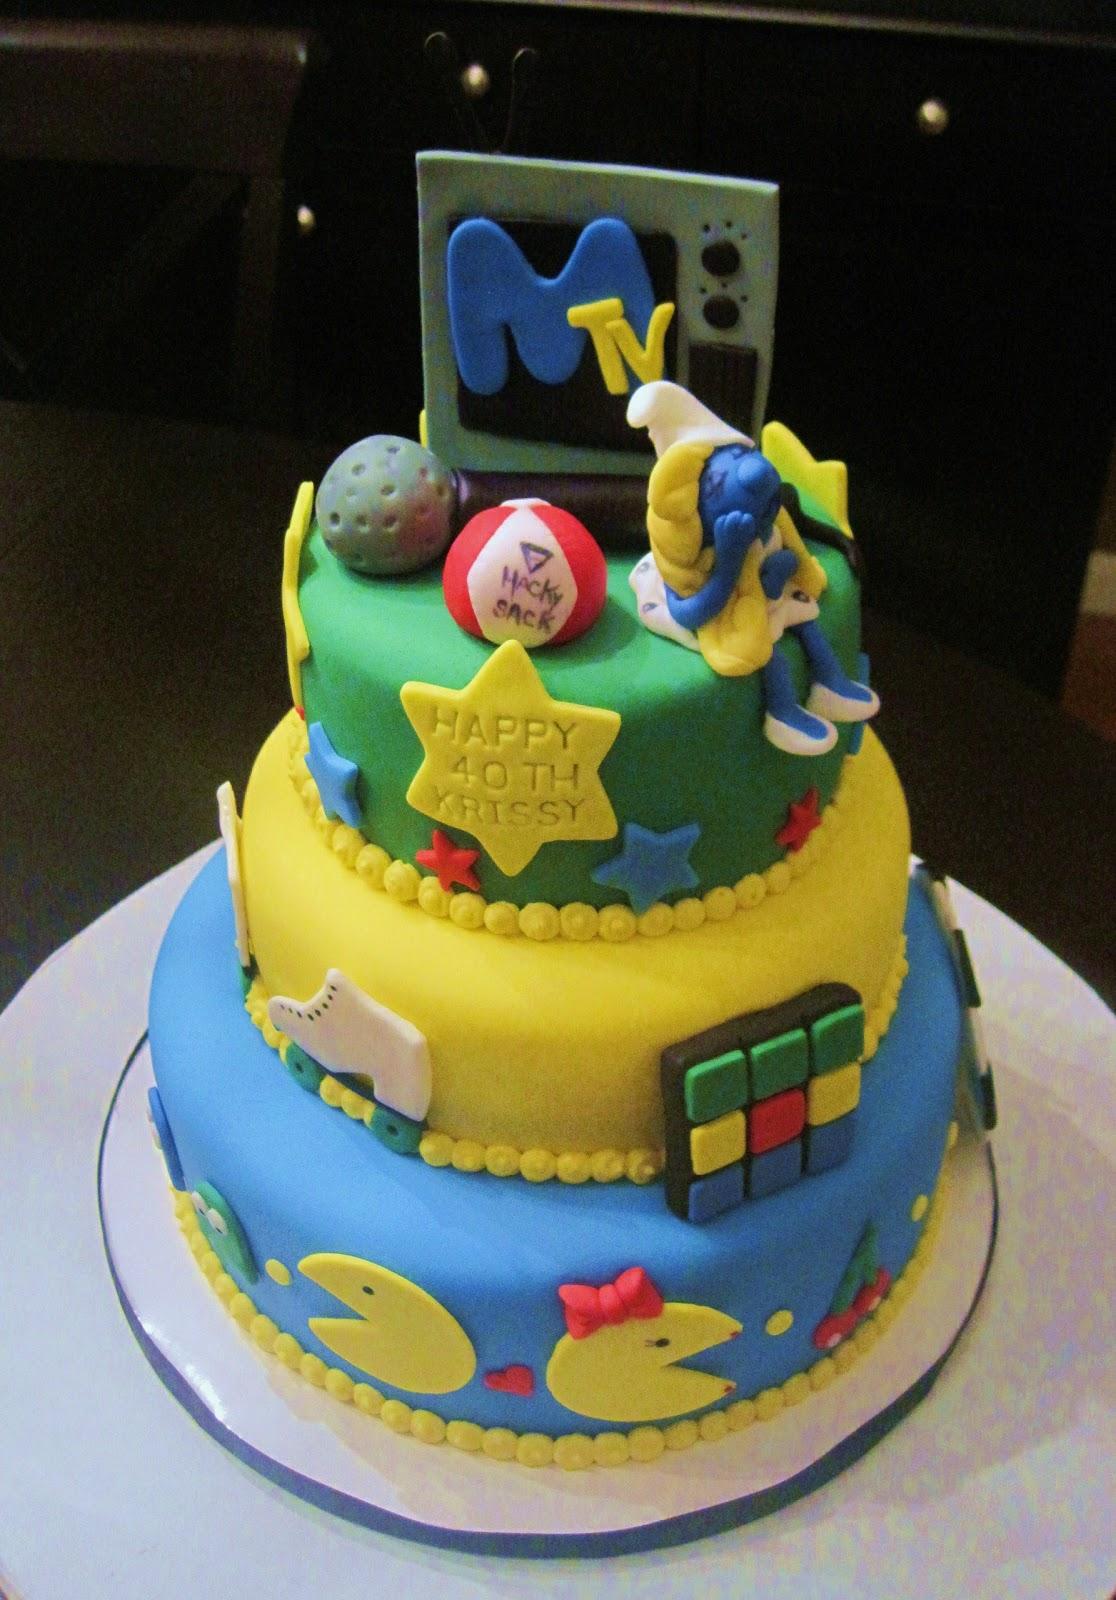 Creative Cakes By Lynn 80 S Themed Birthday Cake